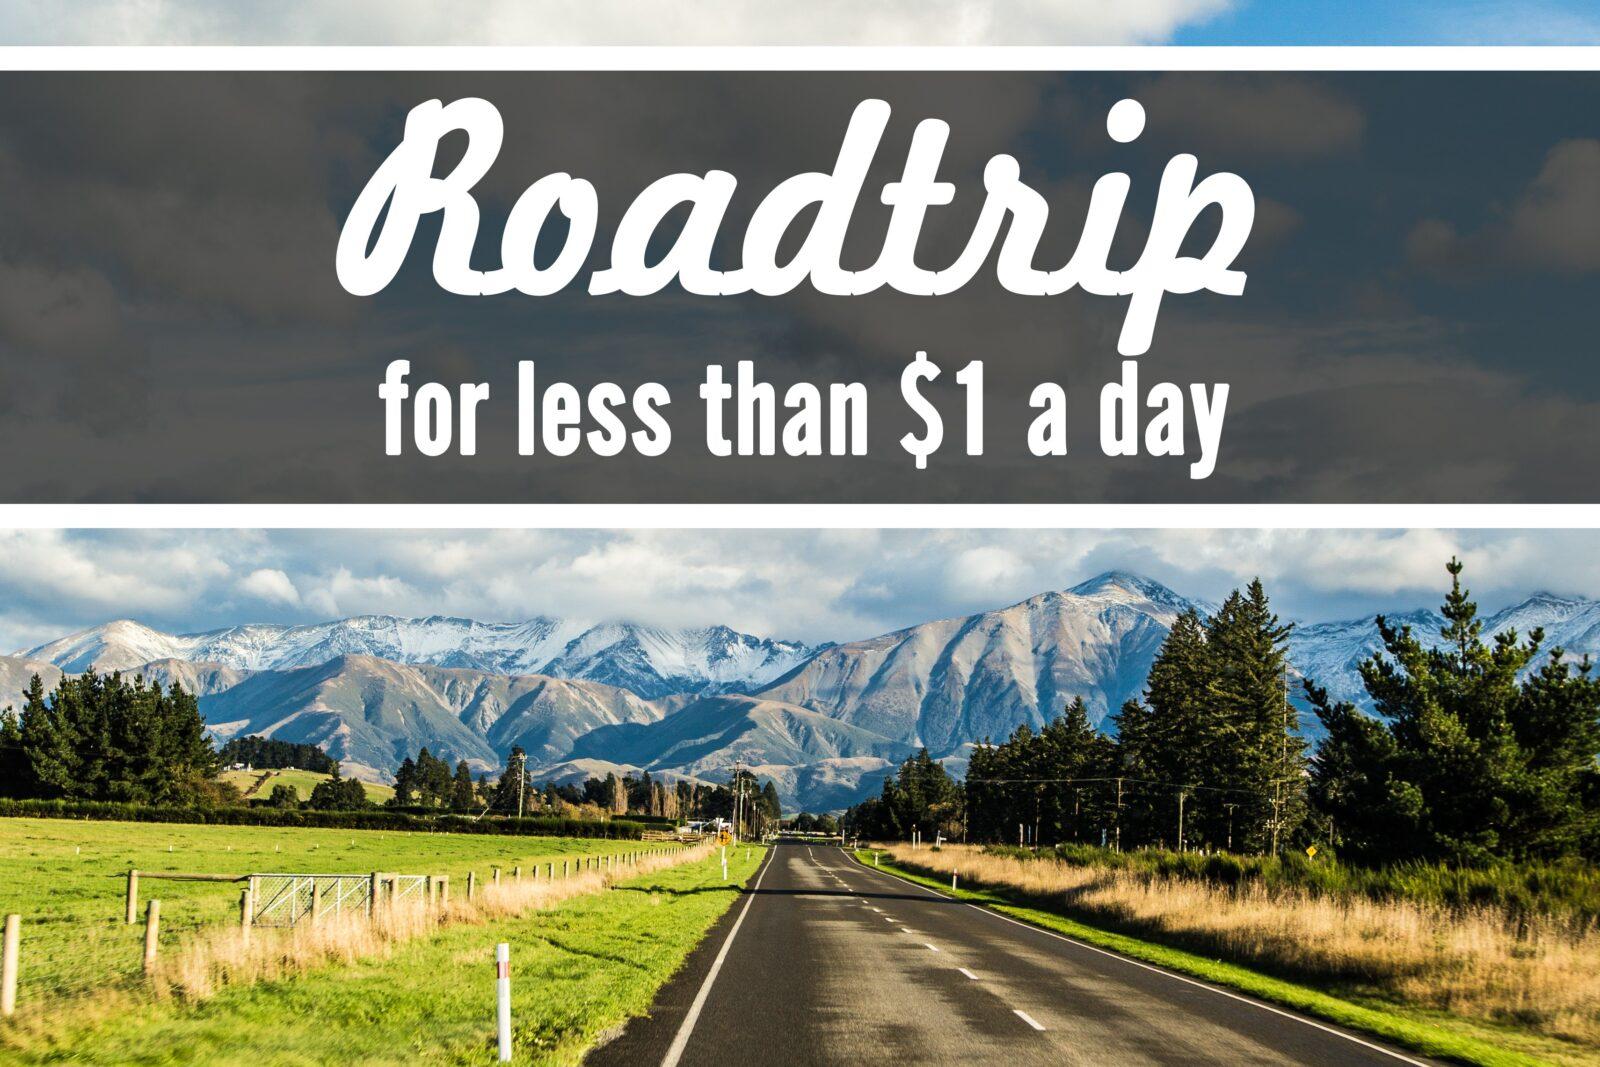 roadtrip america less dollar